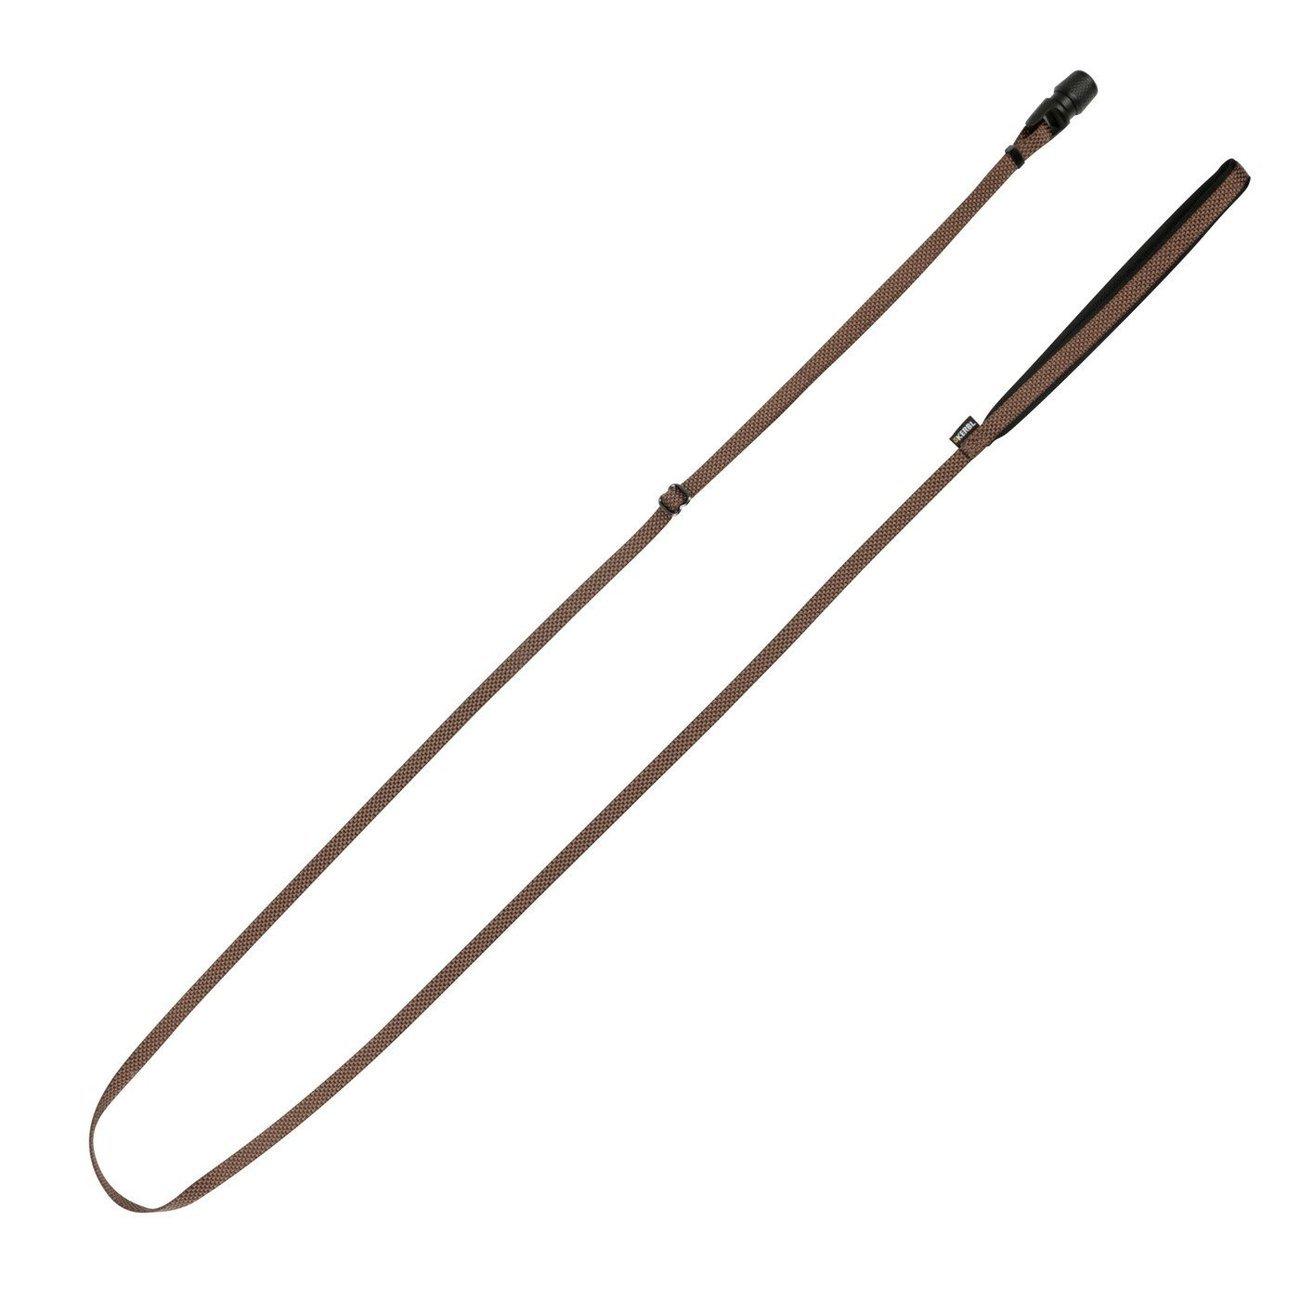 Hundeleine Flat GoLeyGo 2.0, braun, 10mm x 140-200cm